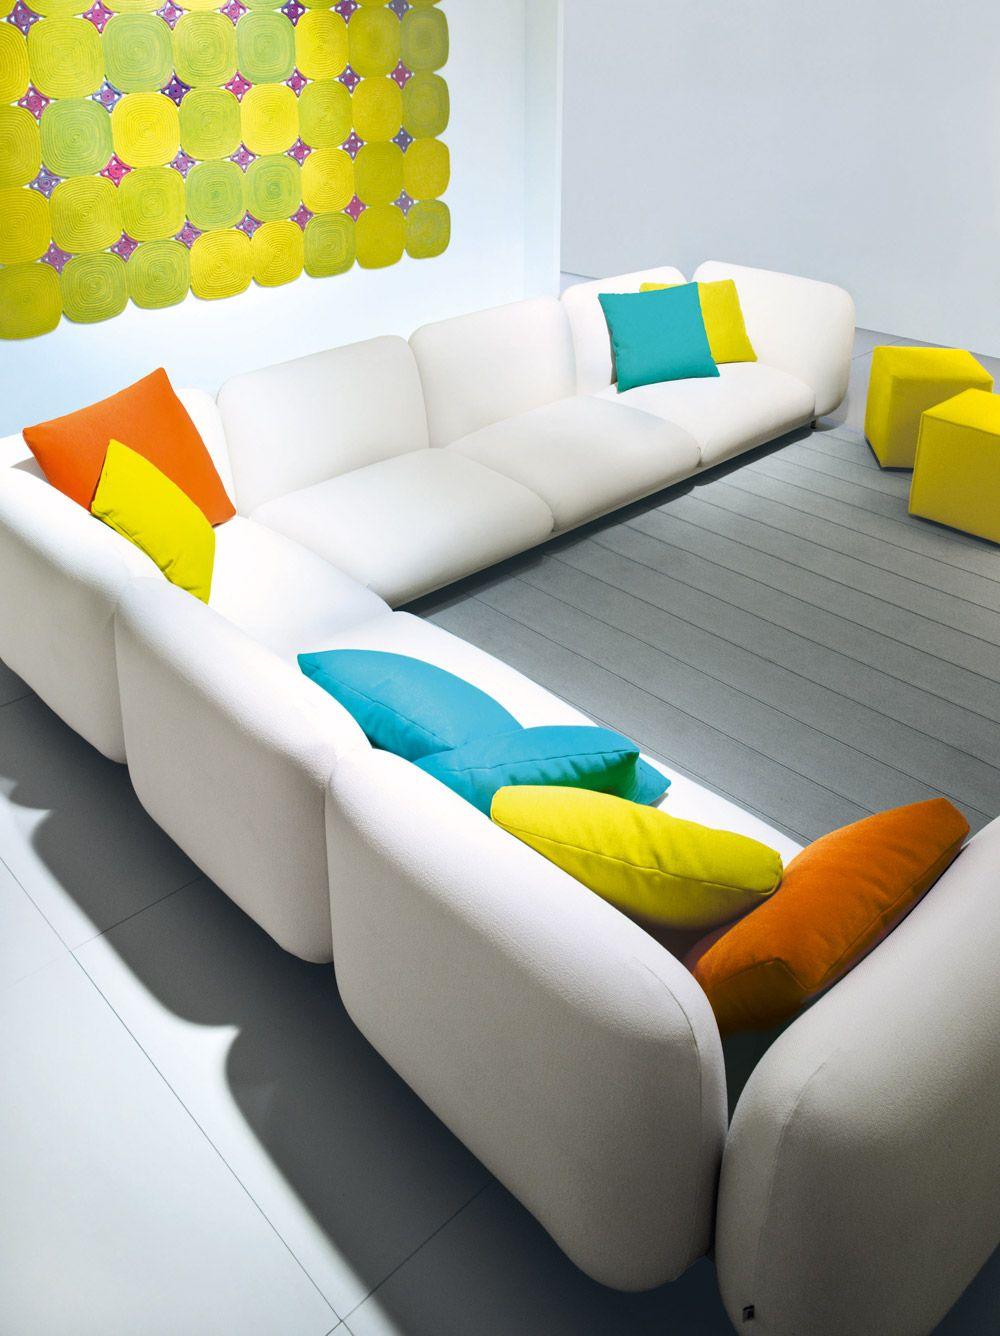 Mellow - Paola Lenti | INTERIOR | Furniture | Pinterest | Modern ...